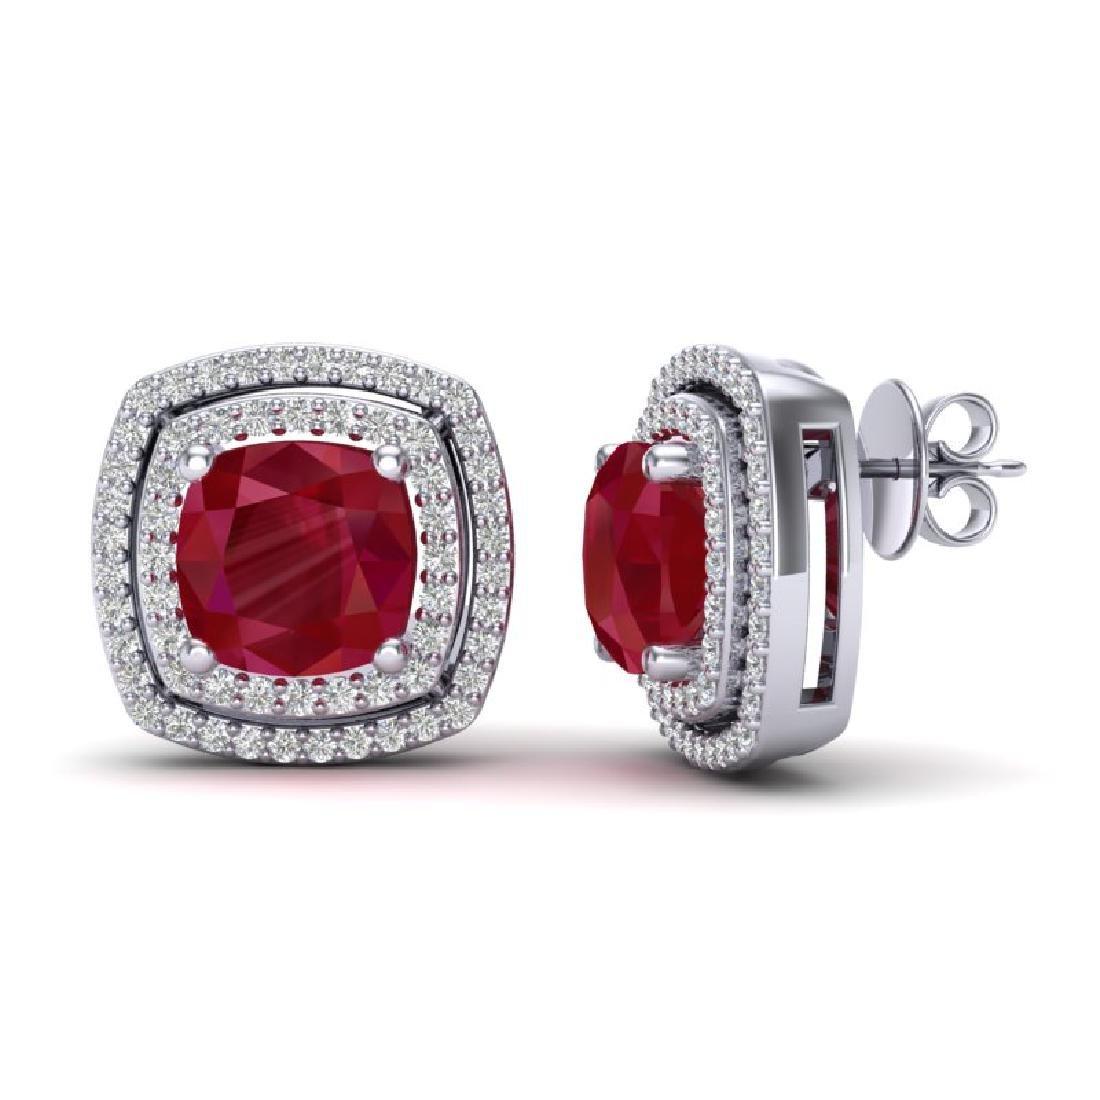 4.95 CTW Ruby & Micro Pave VS/SI Diamond Halo Earrings - 2